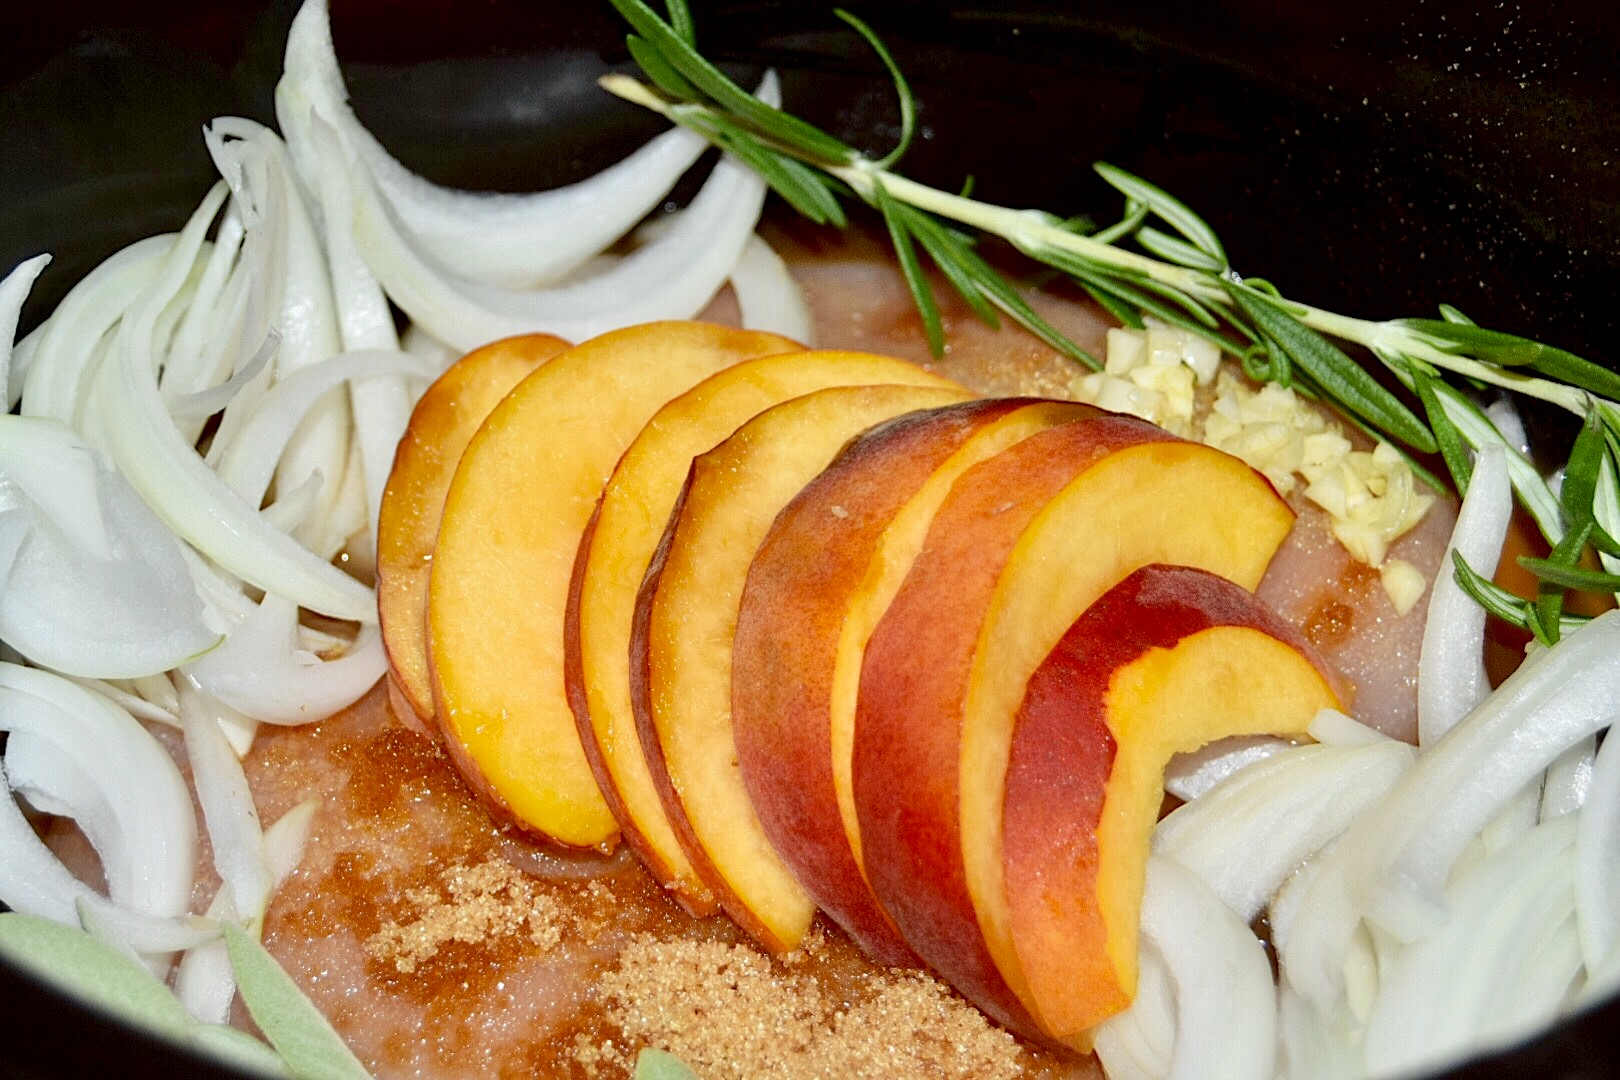 crockpot peach tea chicken recipe with honest tea by crockpot empire #shop #cbias #RefreshinglyHonestSnacks